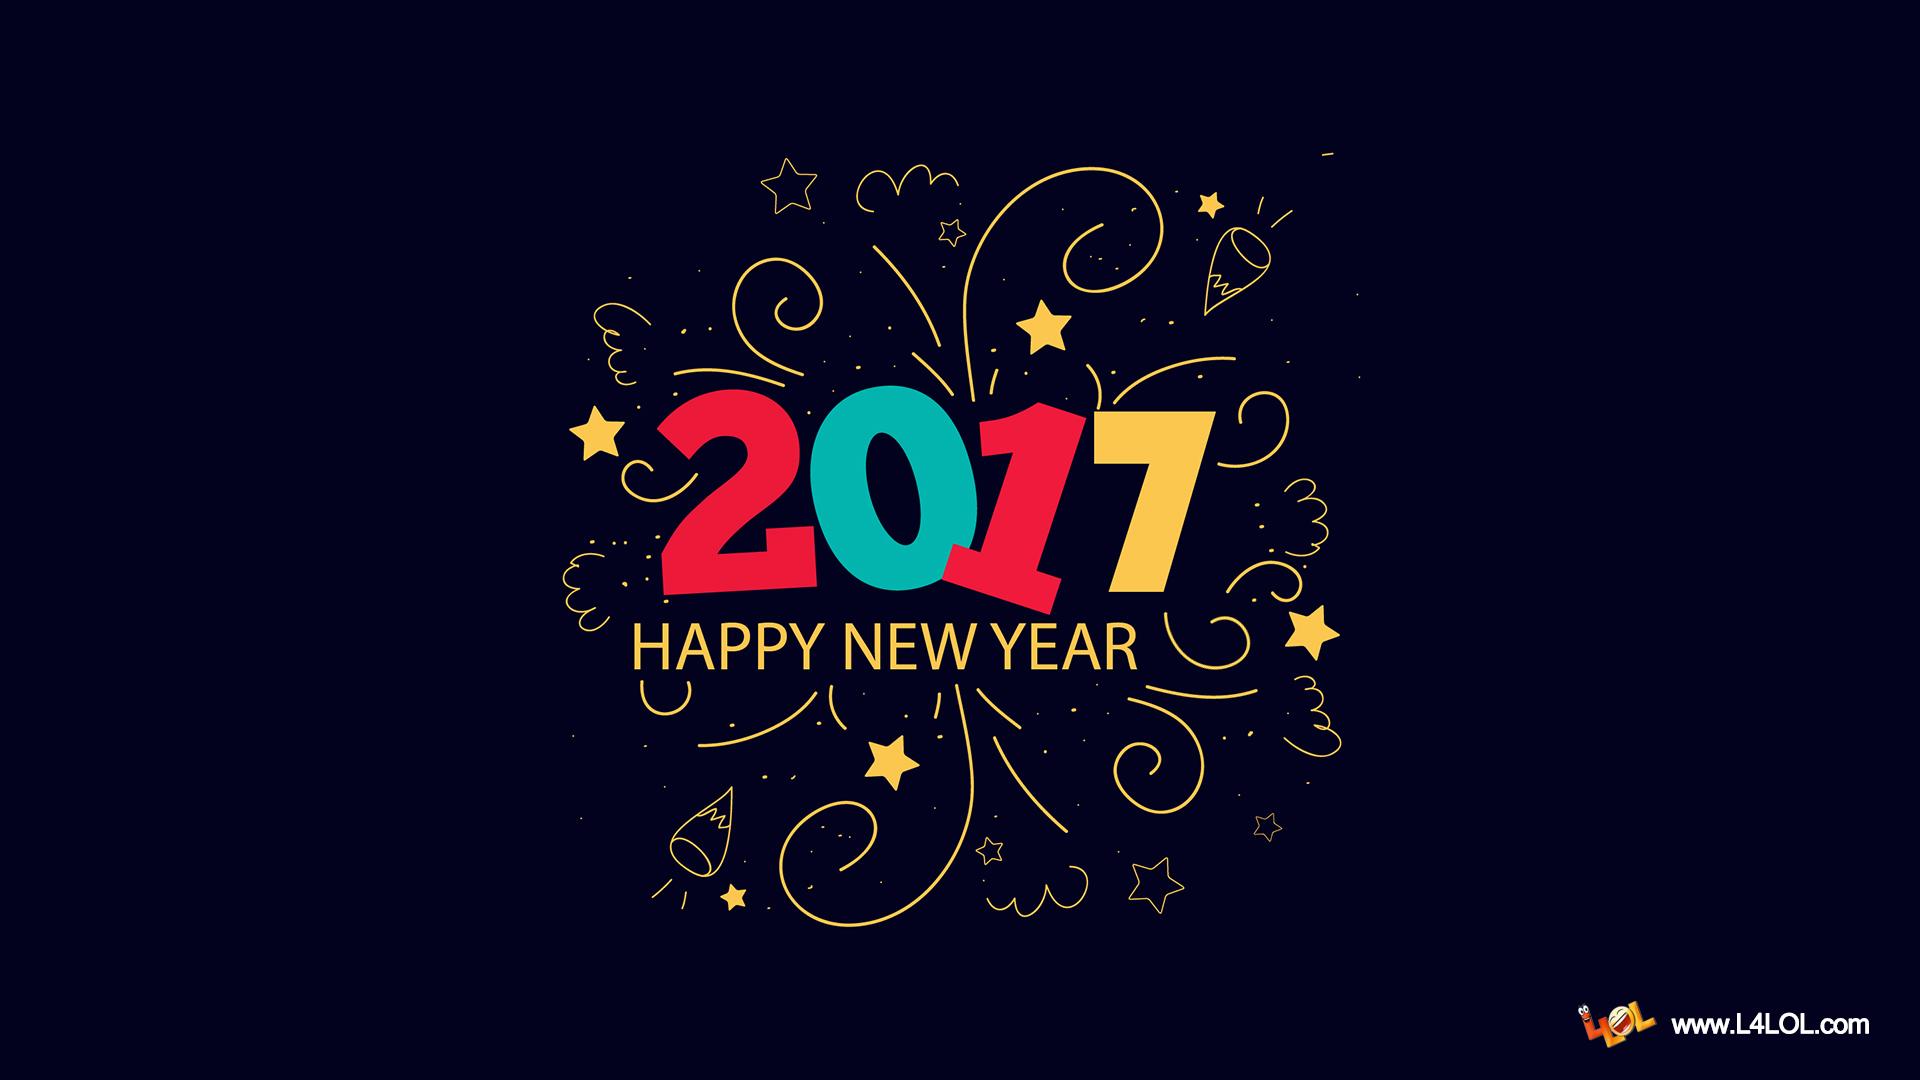 new year 2017 bognor regis and district mcc